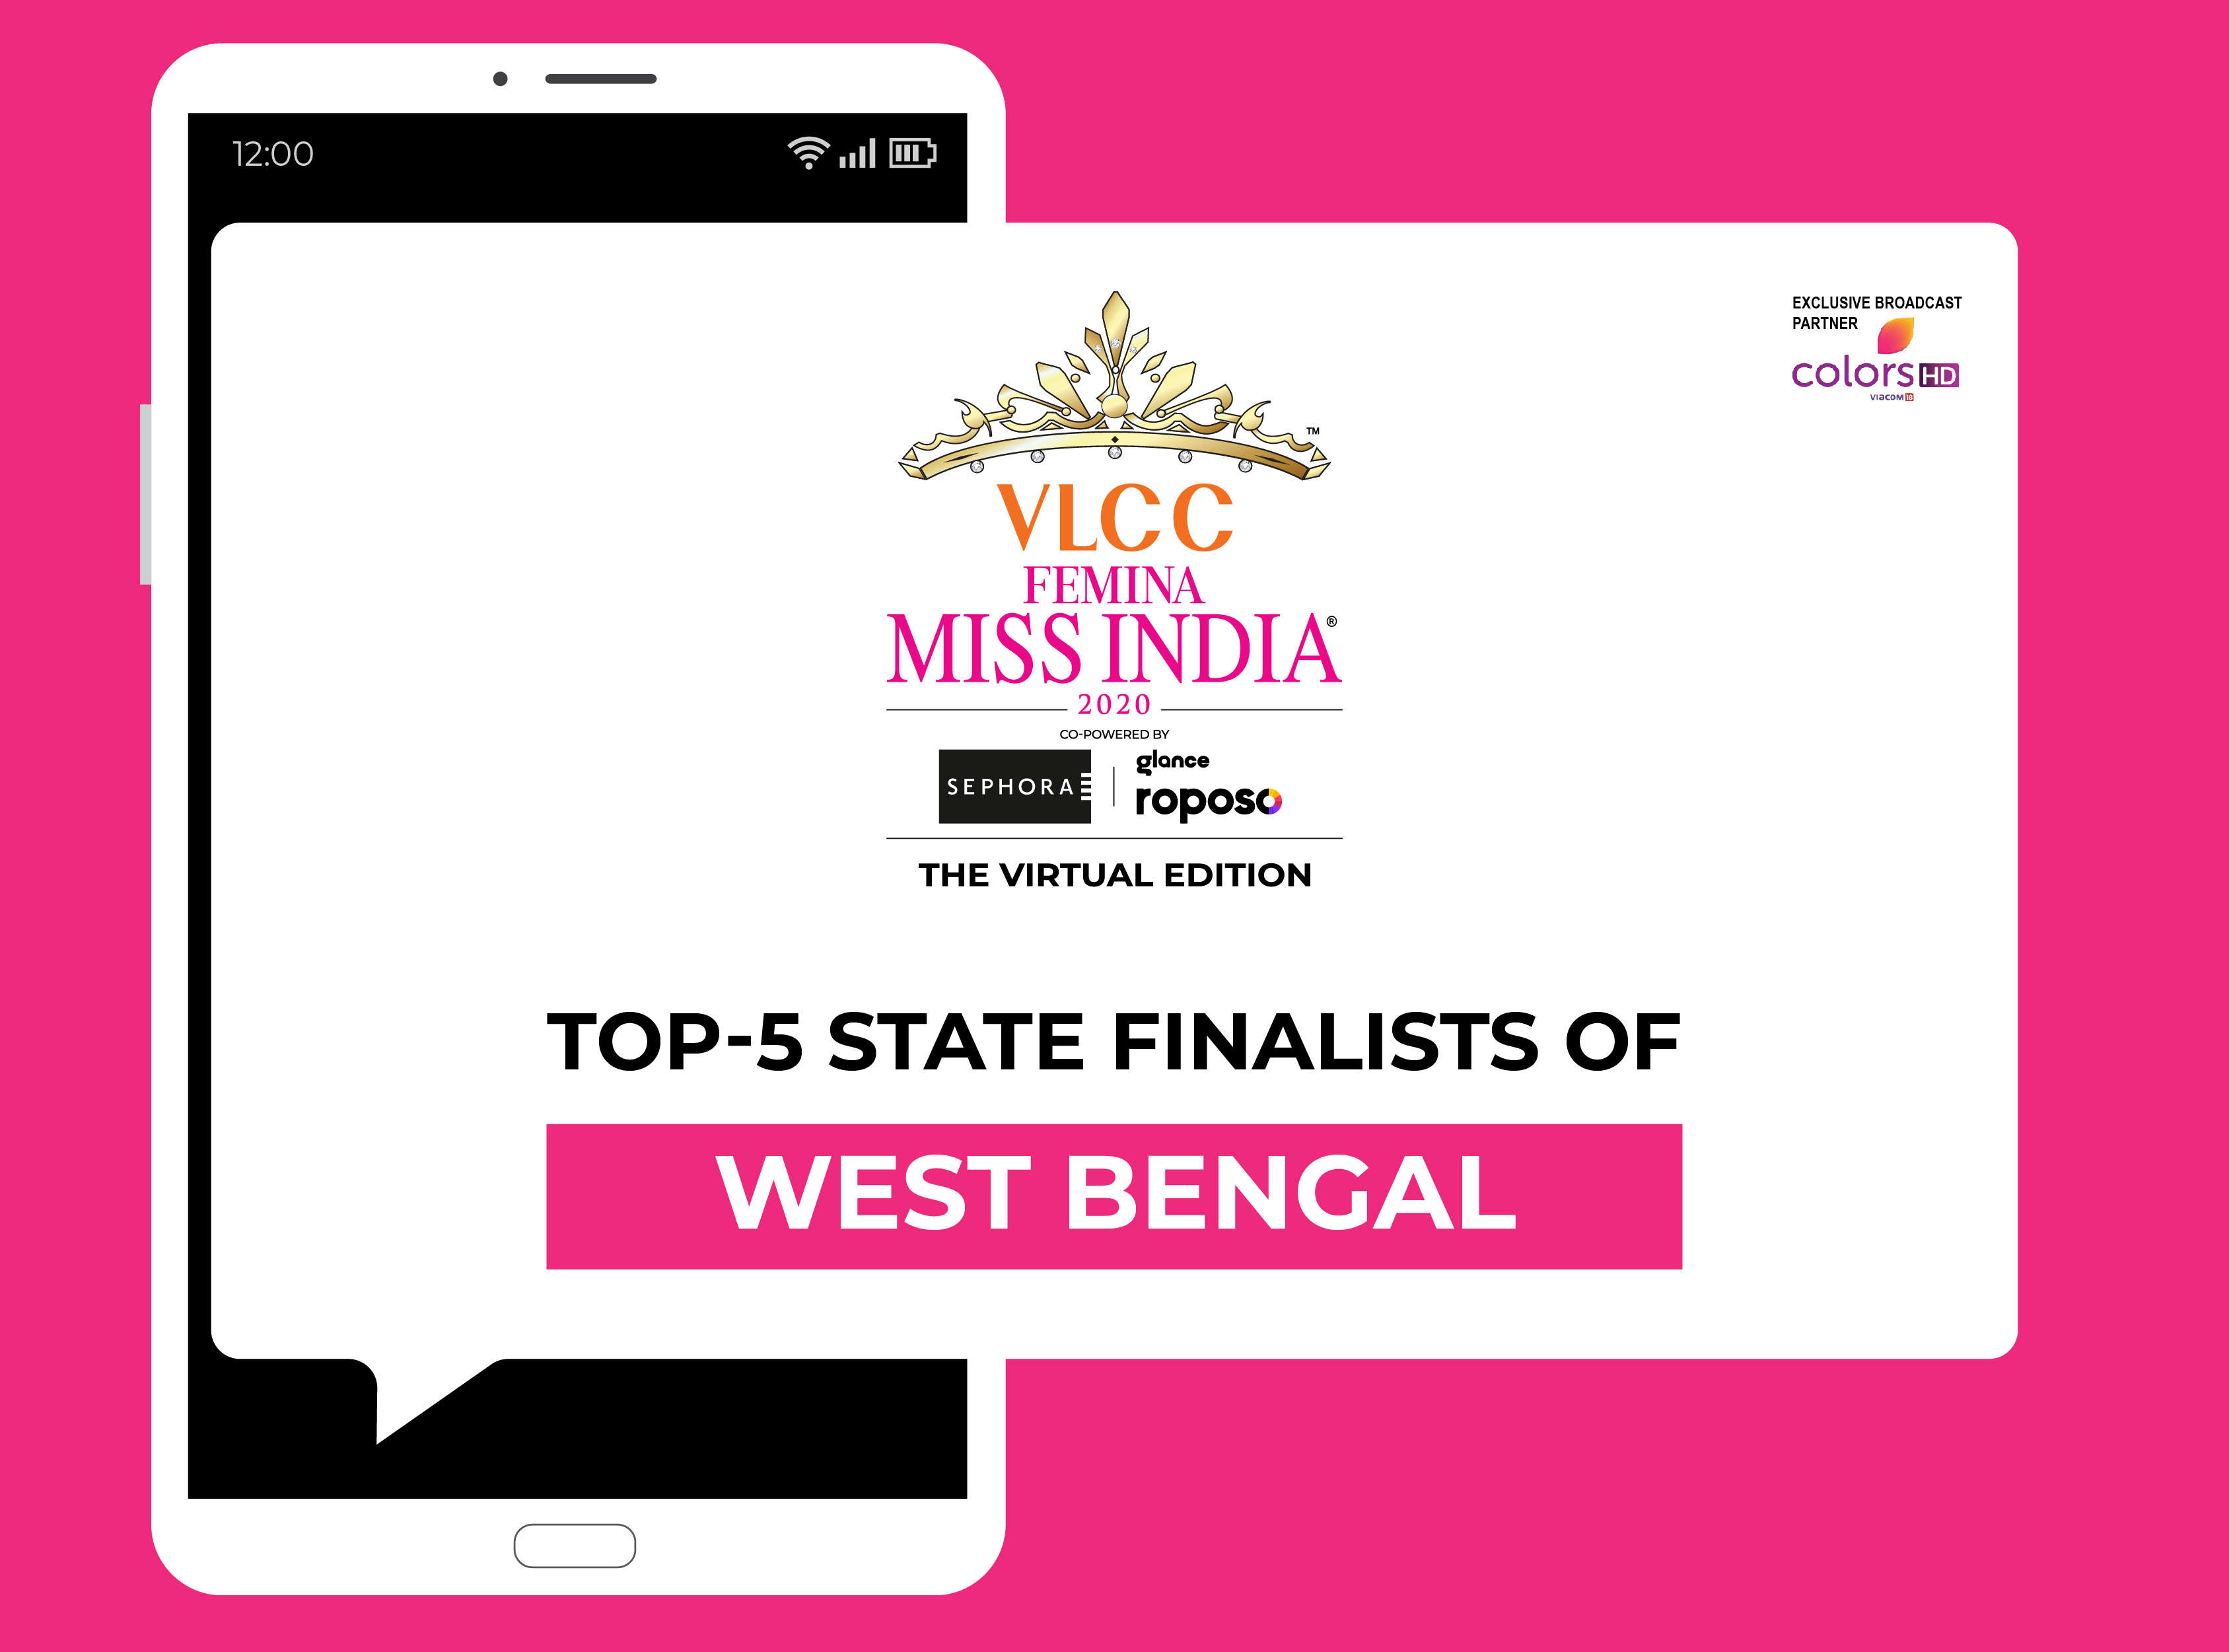 Introducing VLCC Femina Miss India West Bengal 2020 Finalists!